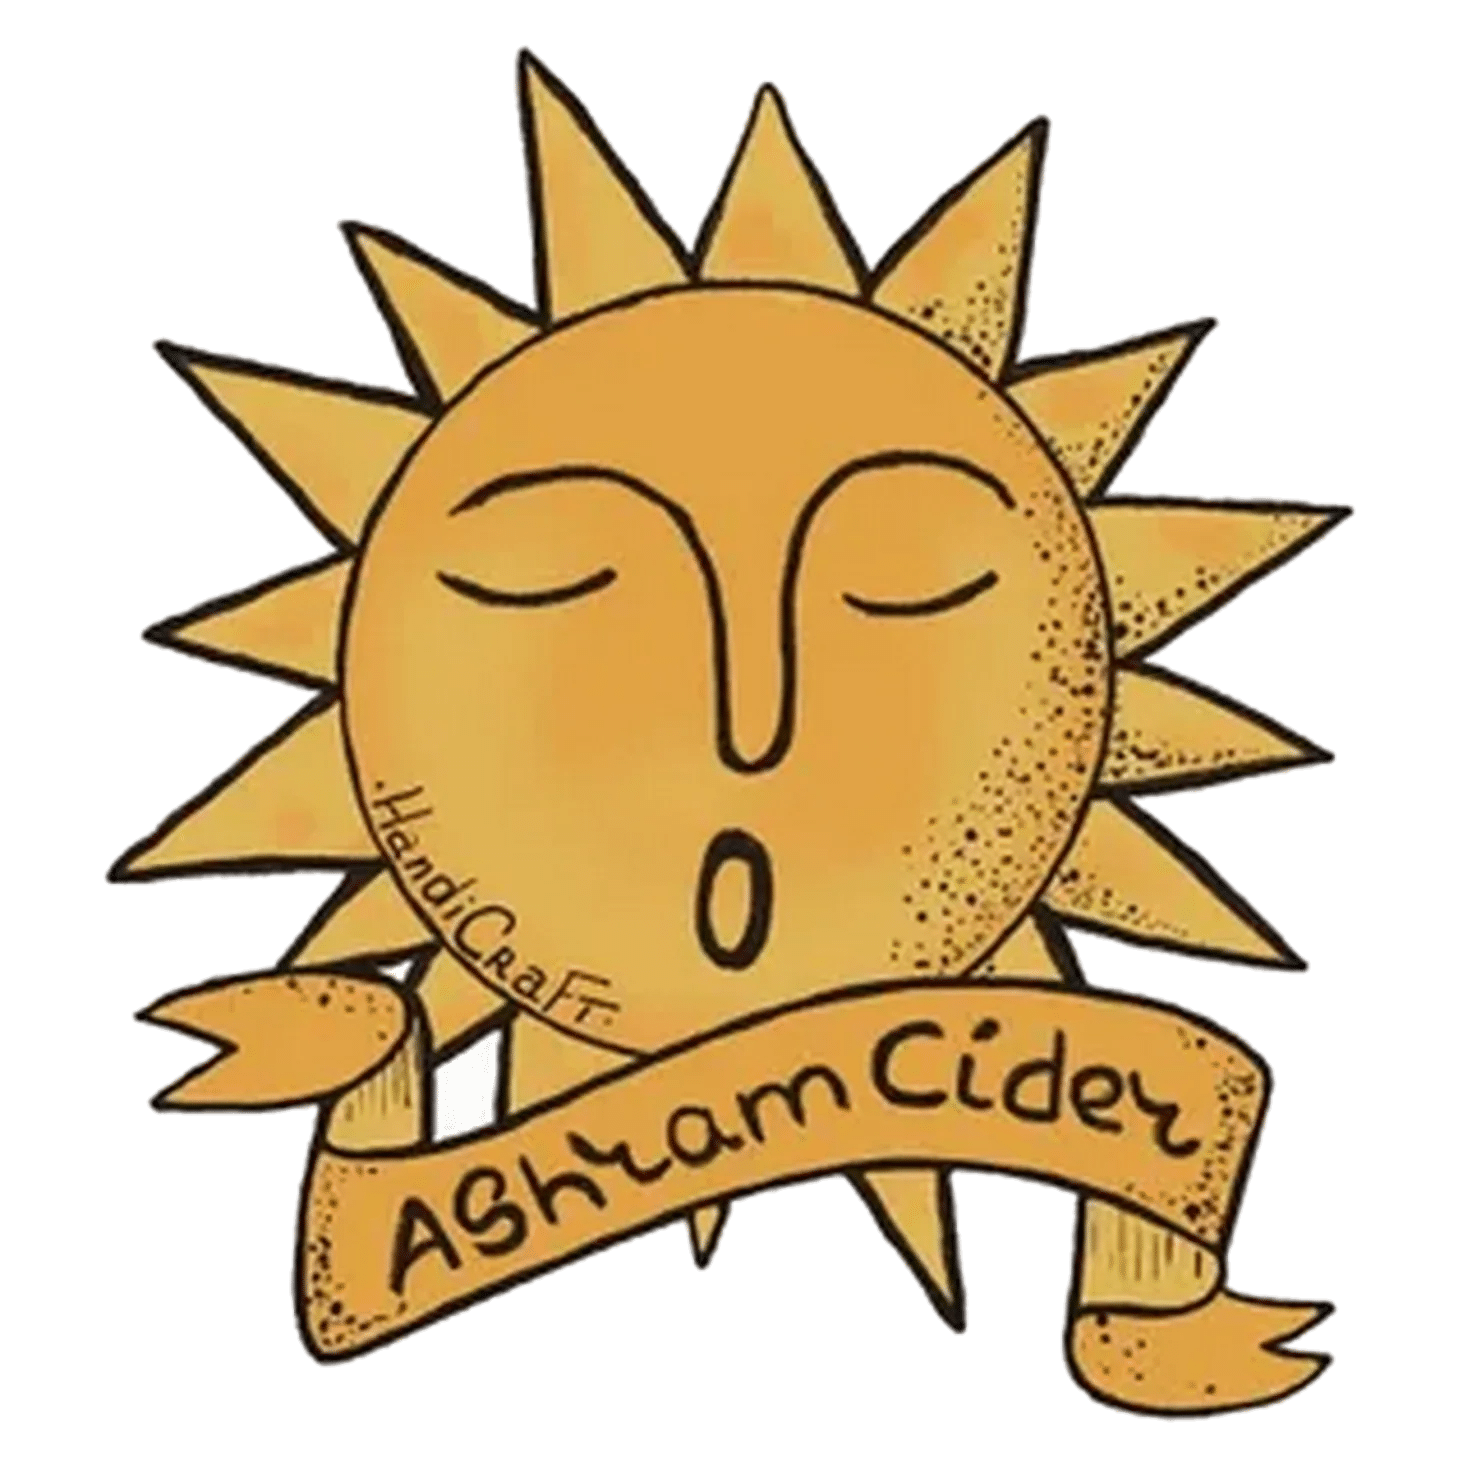 Ashram Cider